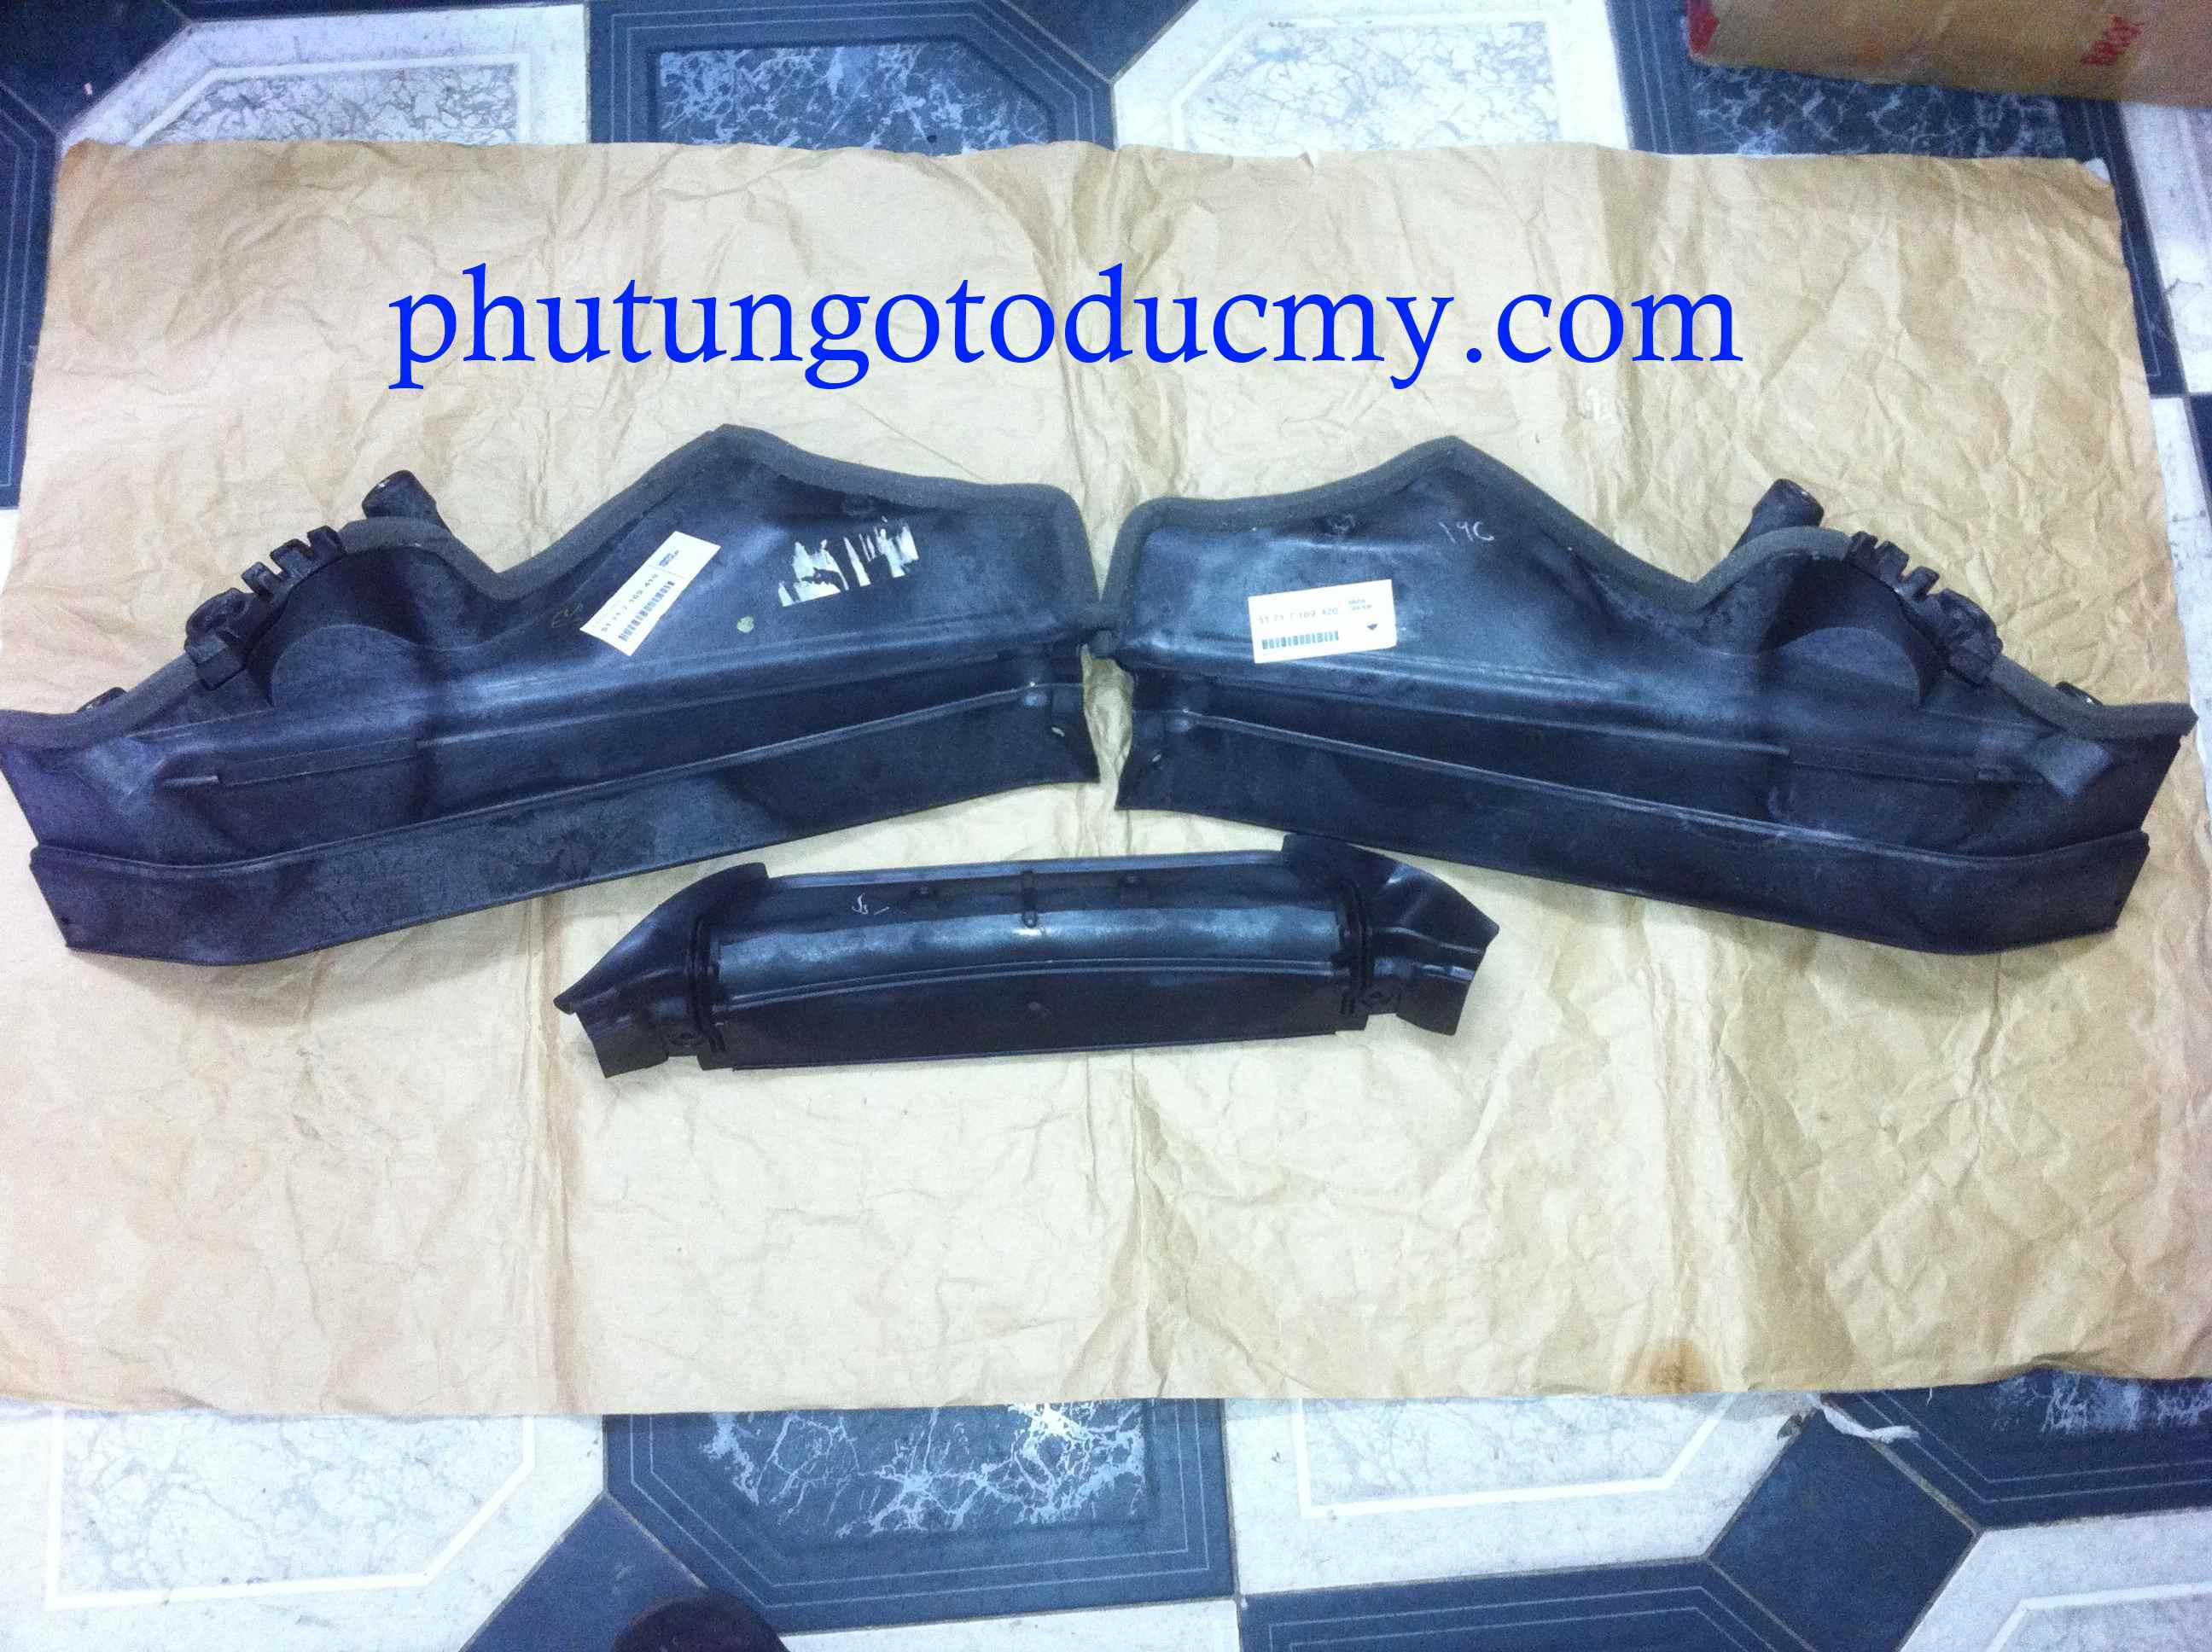 Ốp nhựa khoang máy Bmw X5 E70, X6 E71 - 51717169419